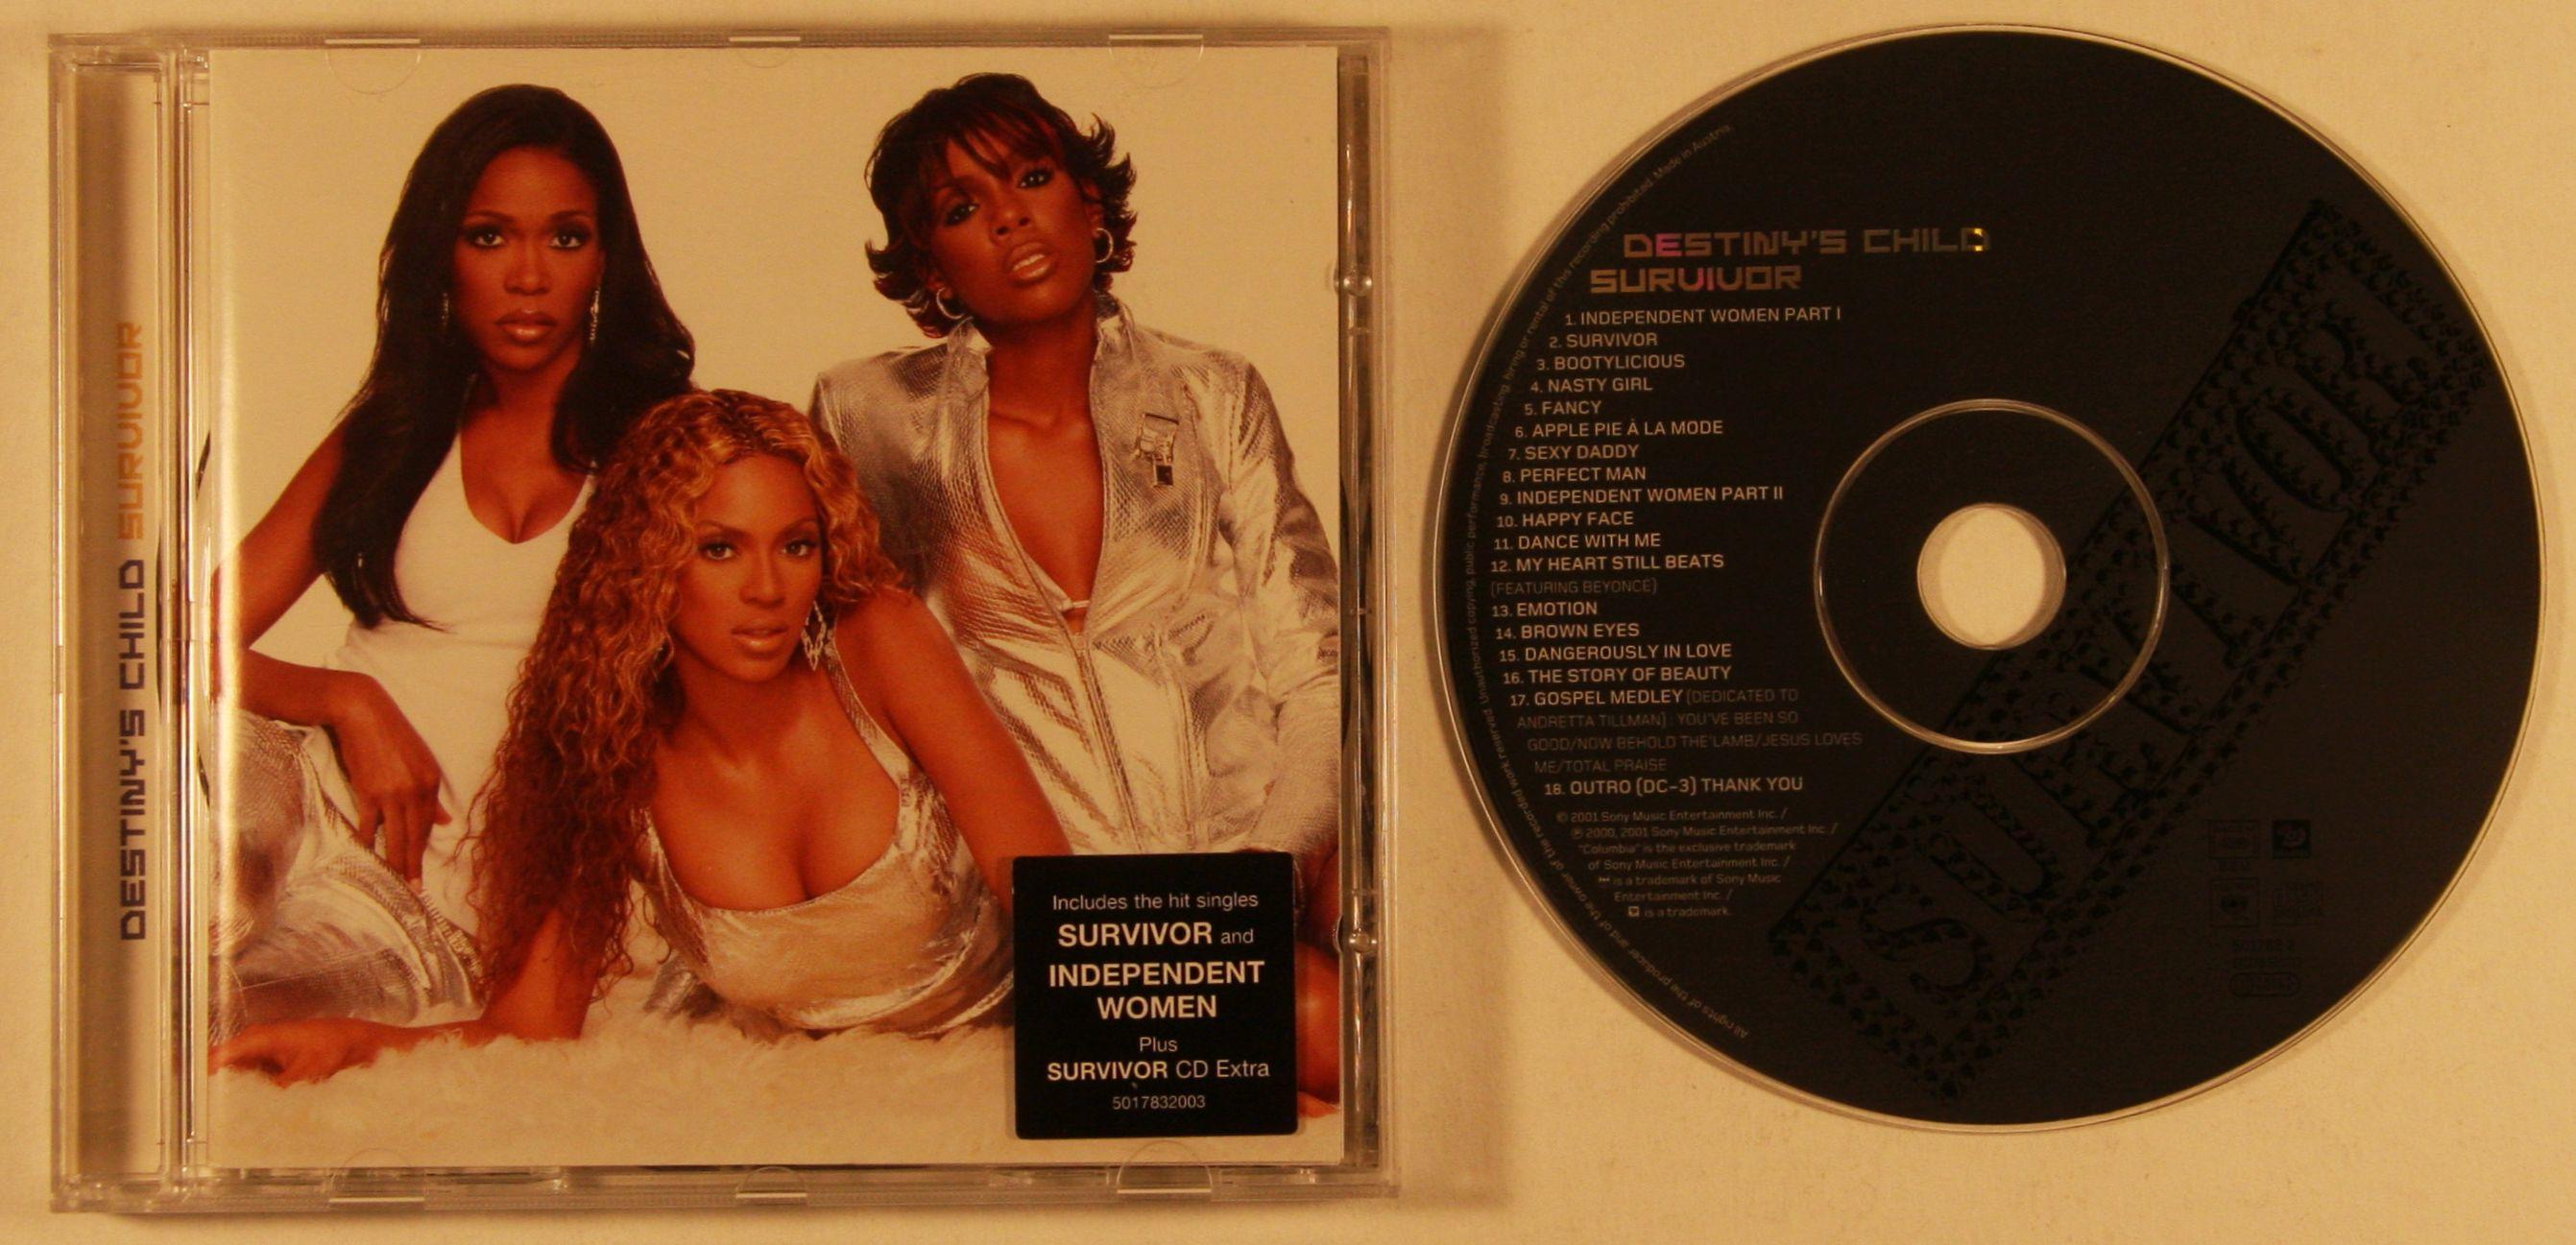 Destiny's Child - Survivor CD